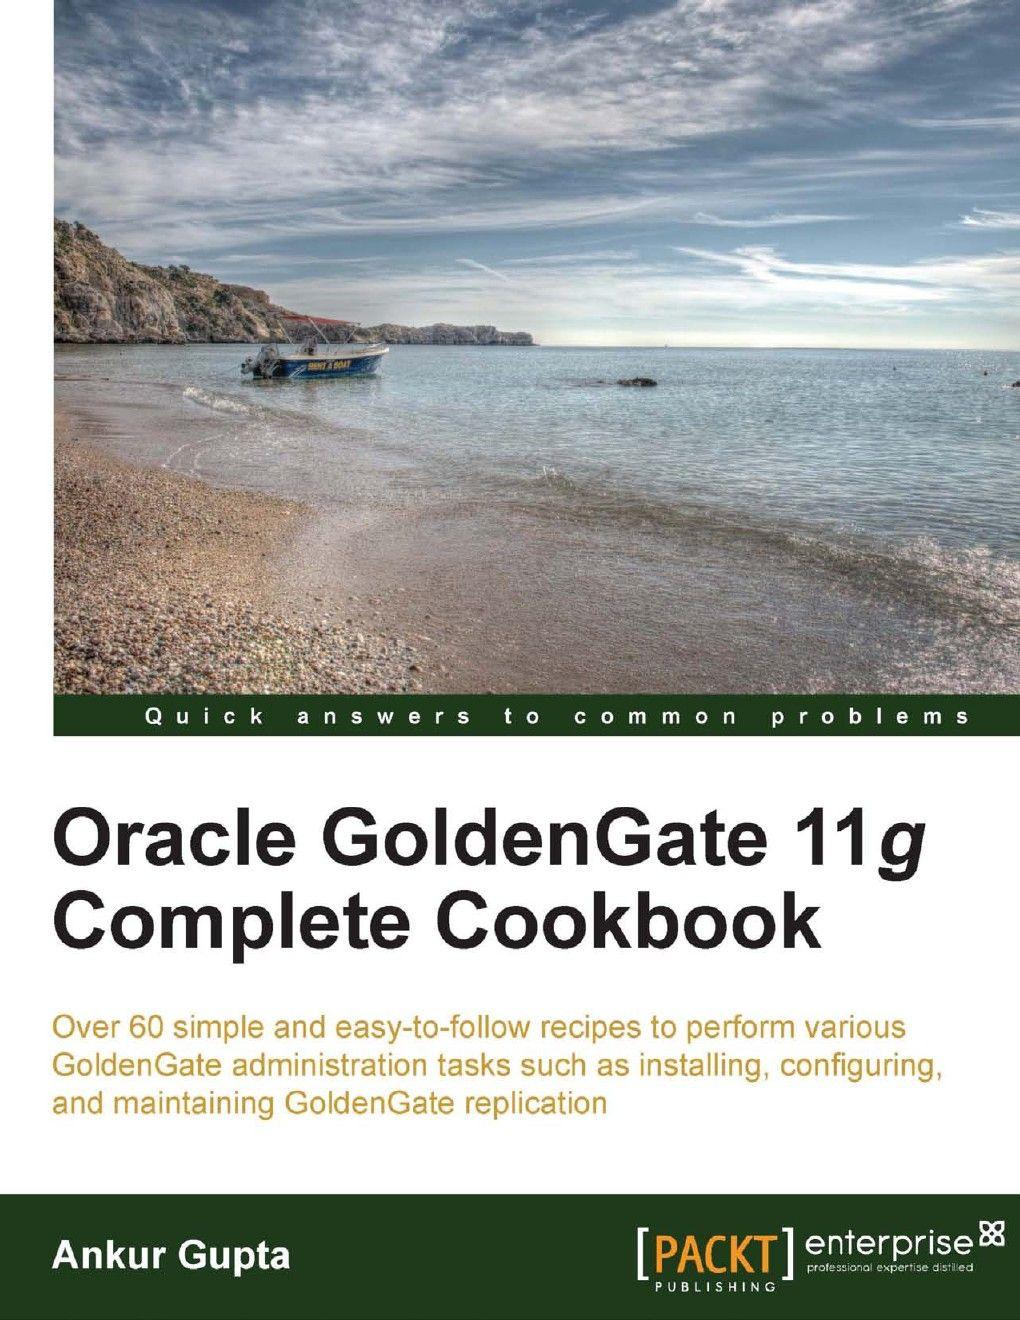 Oracle goldengate 11g complete cookbook ebook dl free download oracle goldengate 11g complete cookbook ebook dl free download ebooks video tutorials baditri Choice Image